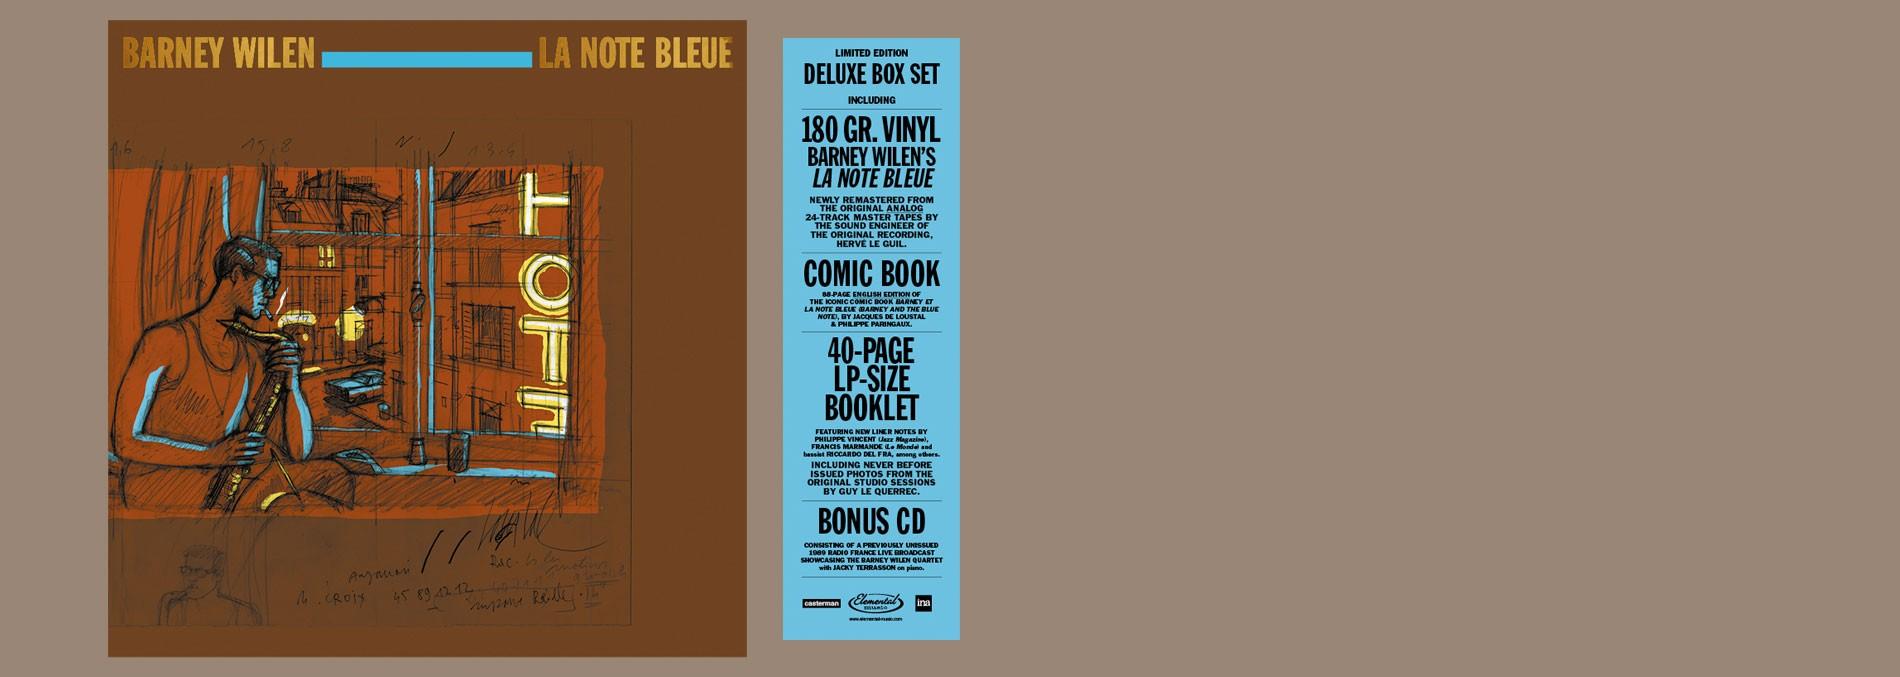 BARNEY WILEN LA NOTE BLEUE - LIMITED EDITION BOX SET